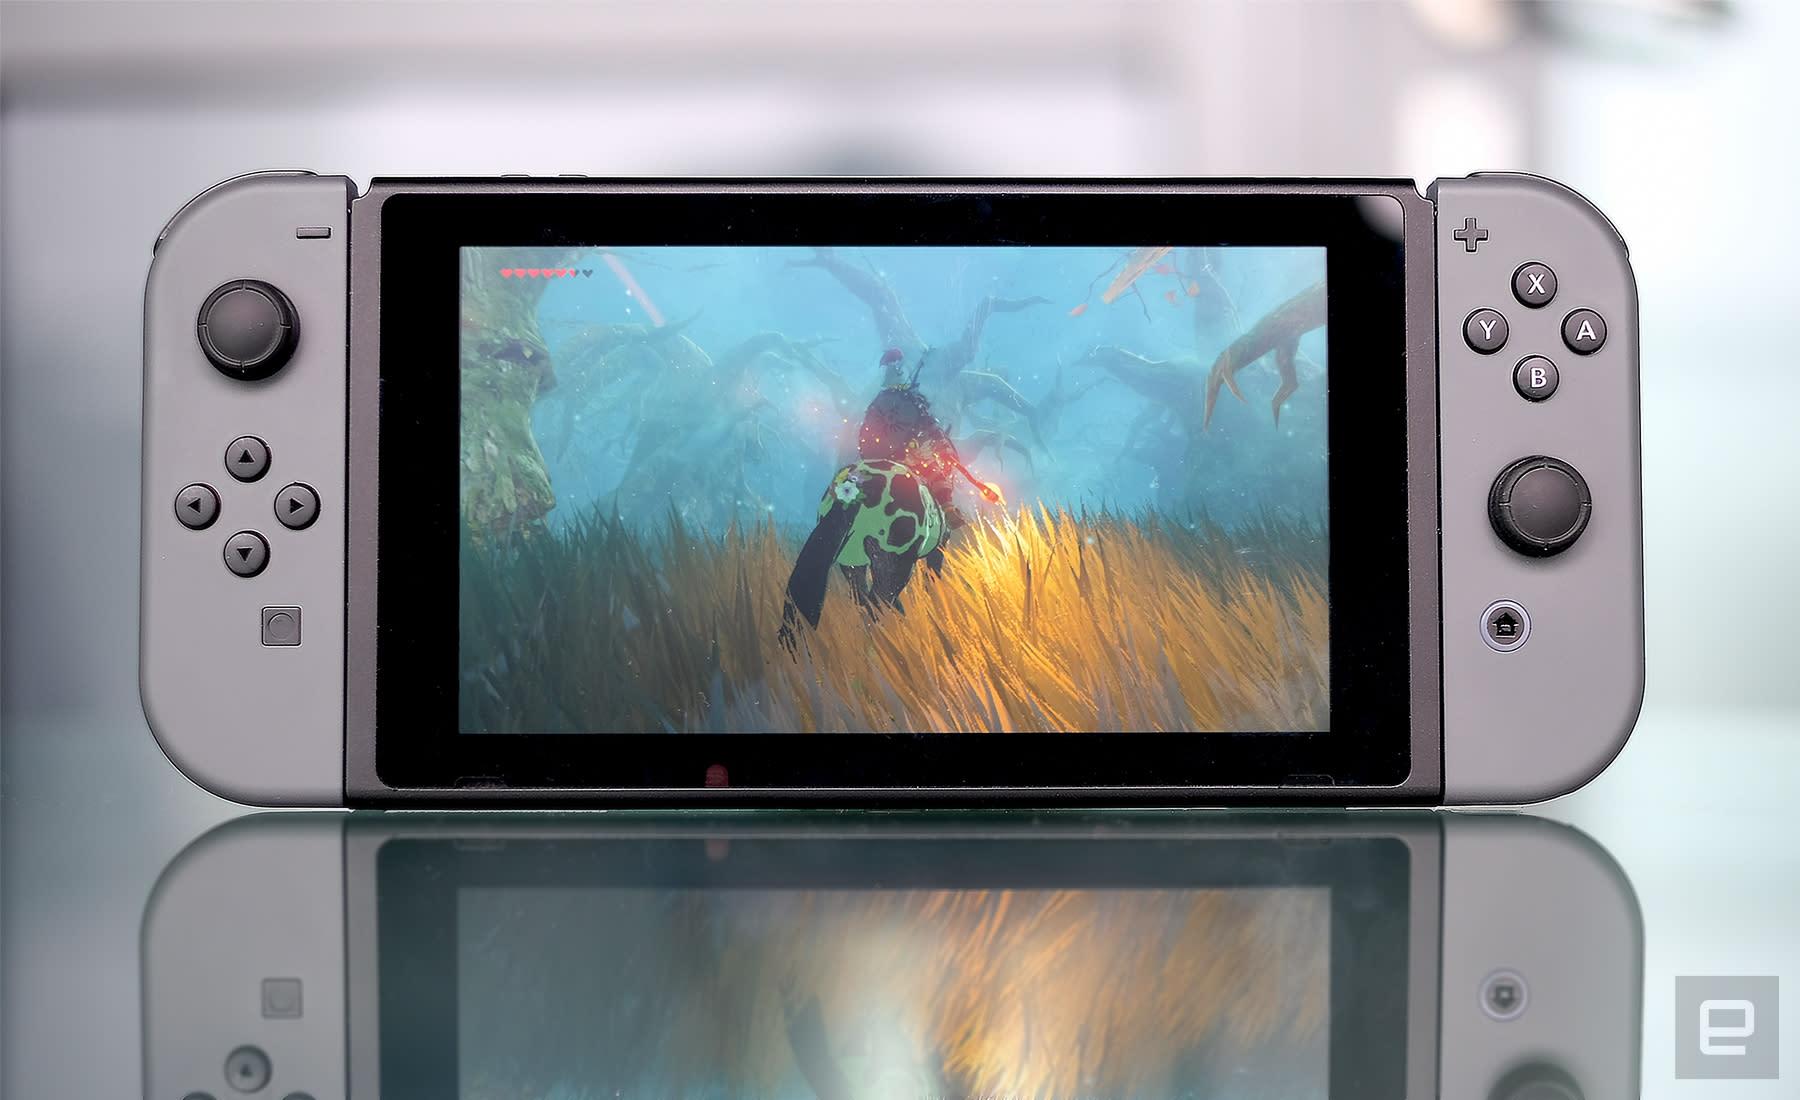 Nintendo Switch review: Revolutionary, but it still needs work